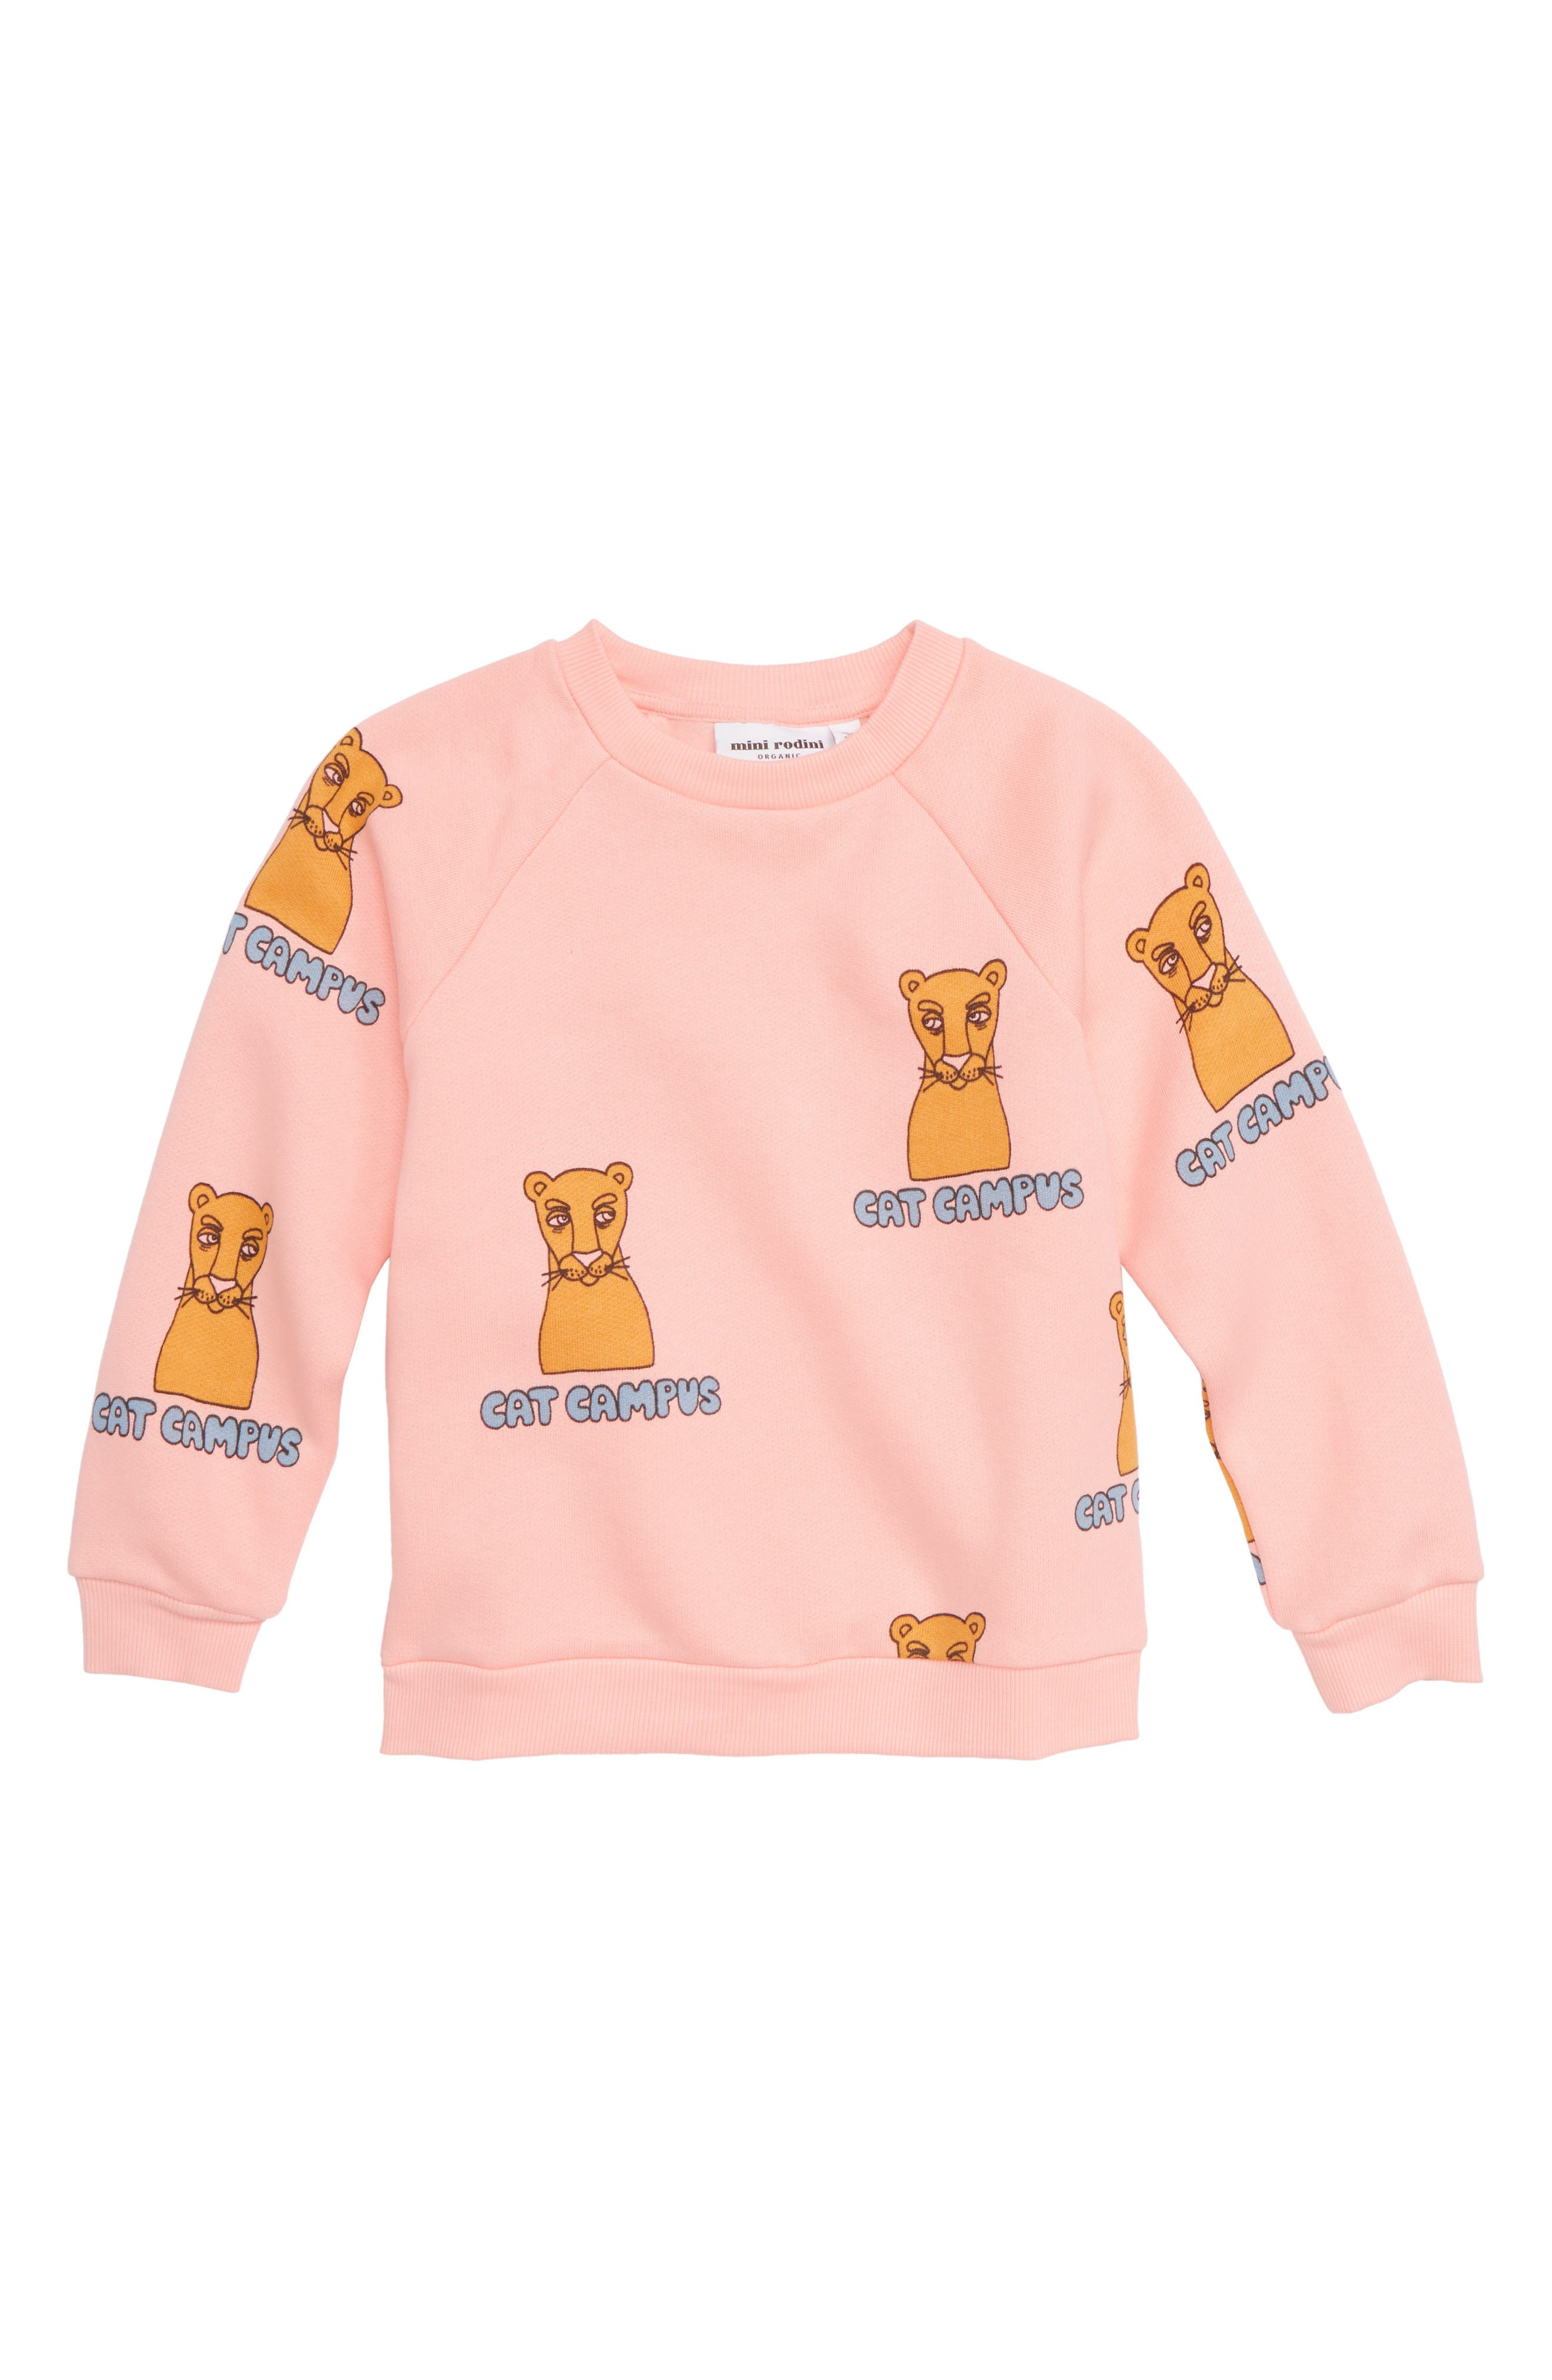 Cat Campus Organic Cotton Sweatshirt,                             Main thumbnail 1, color,                             PINK